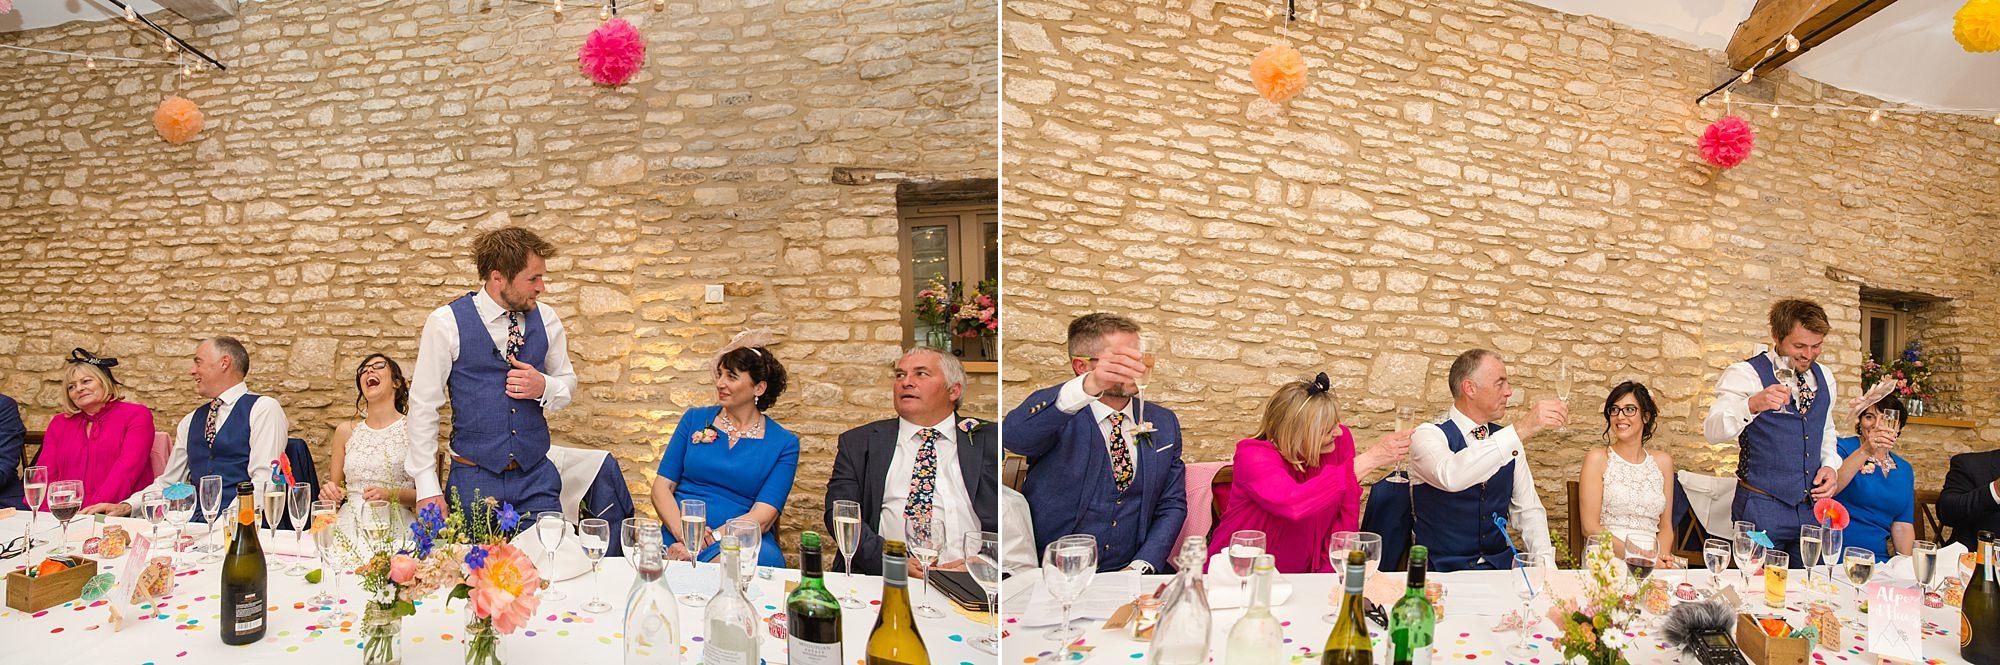 Caswell House Wedding groom giving speech